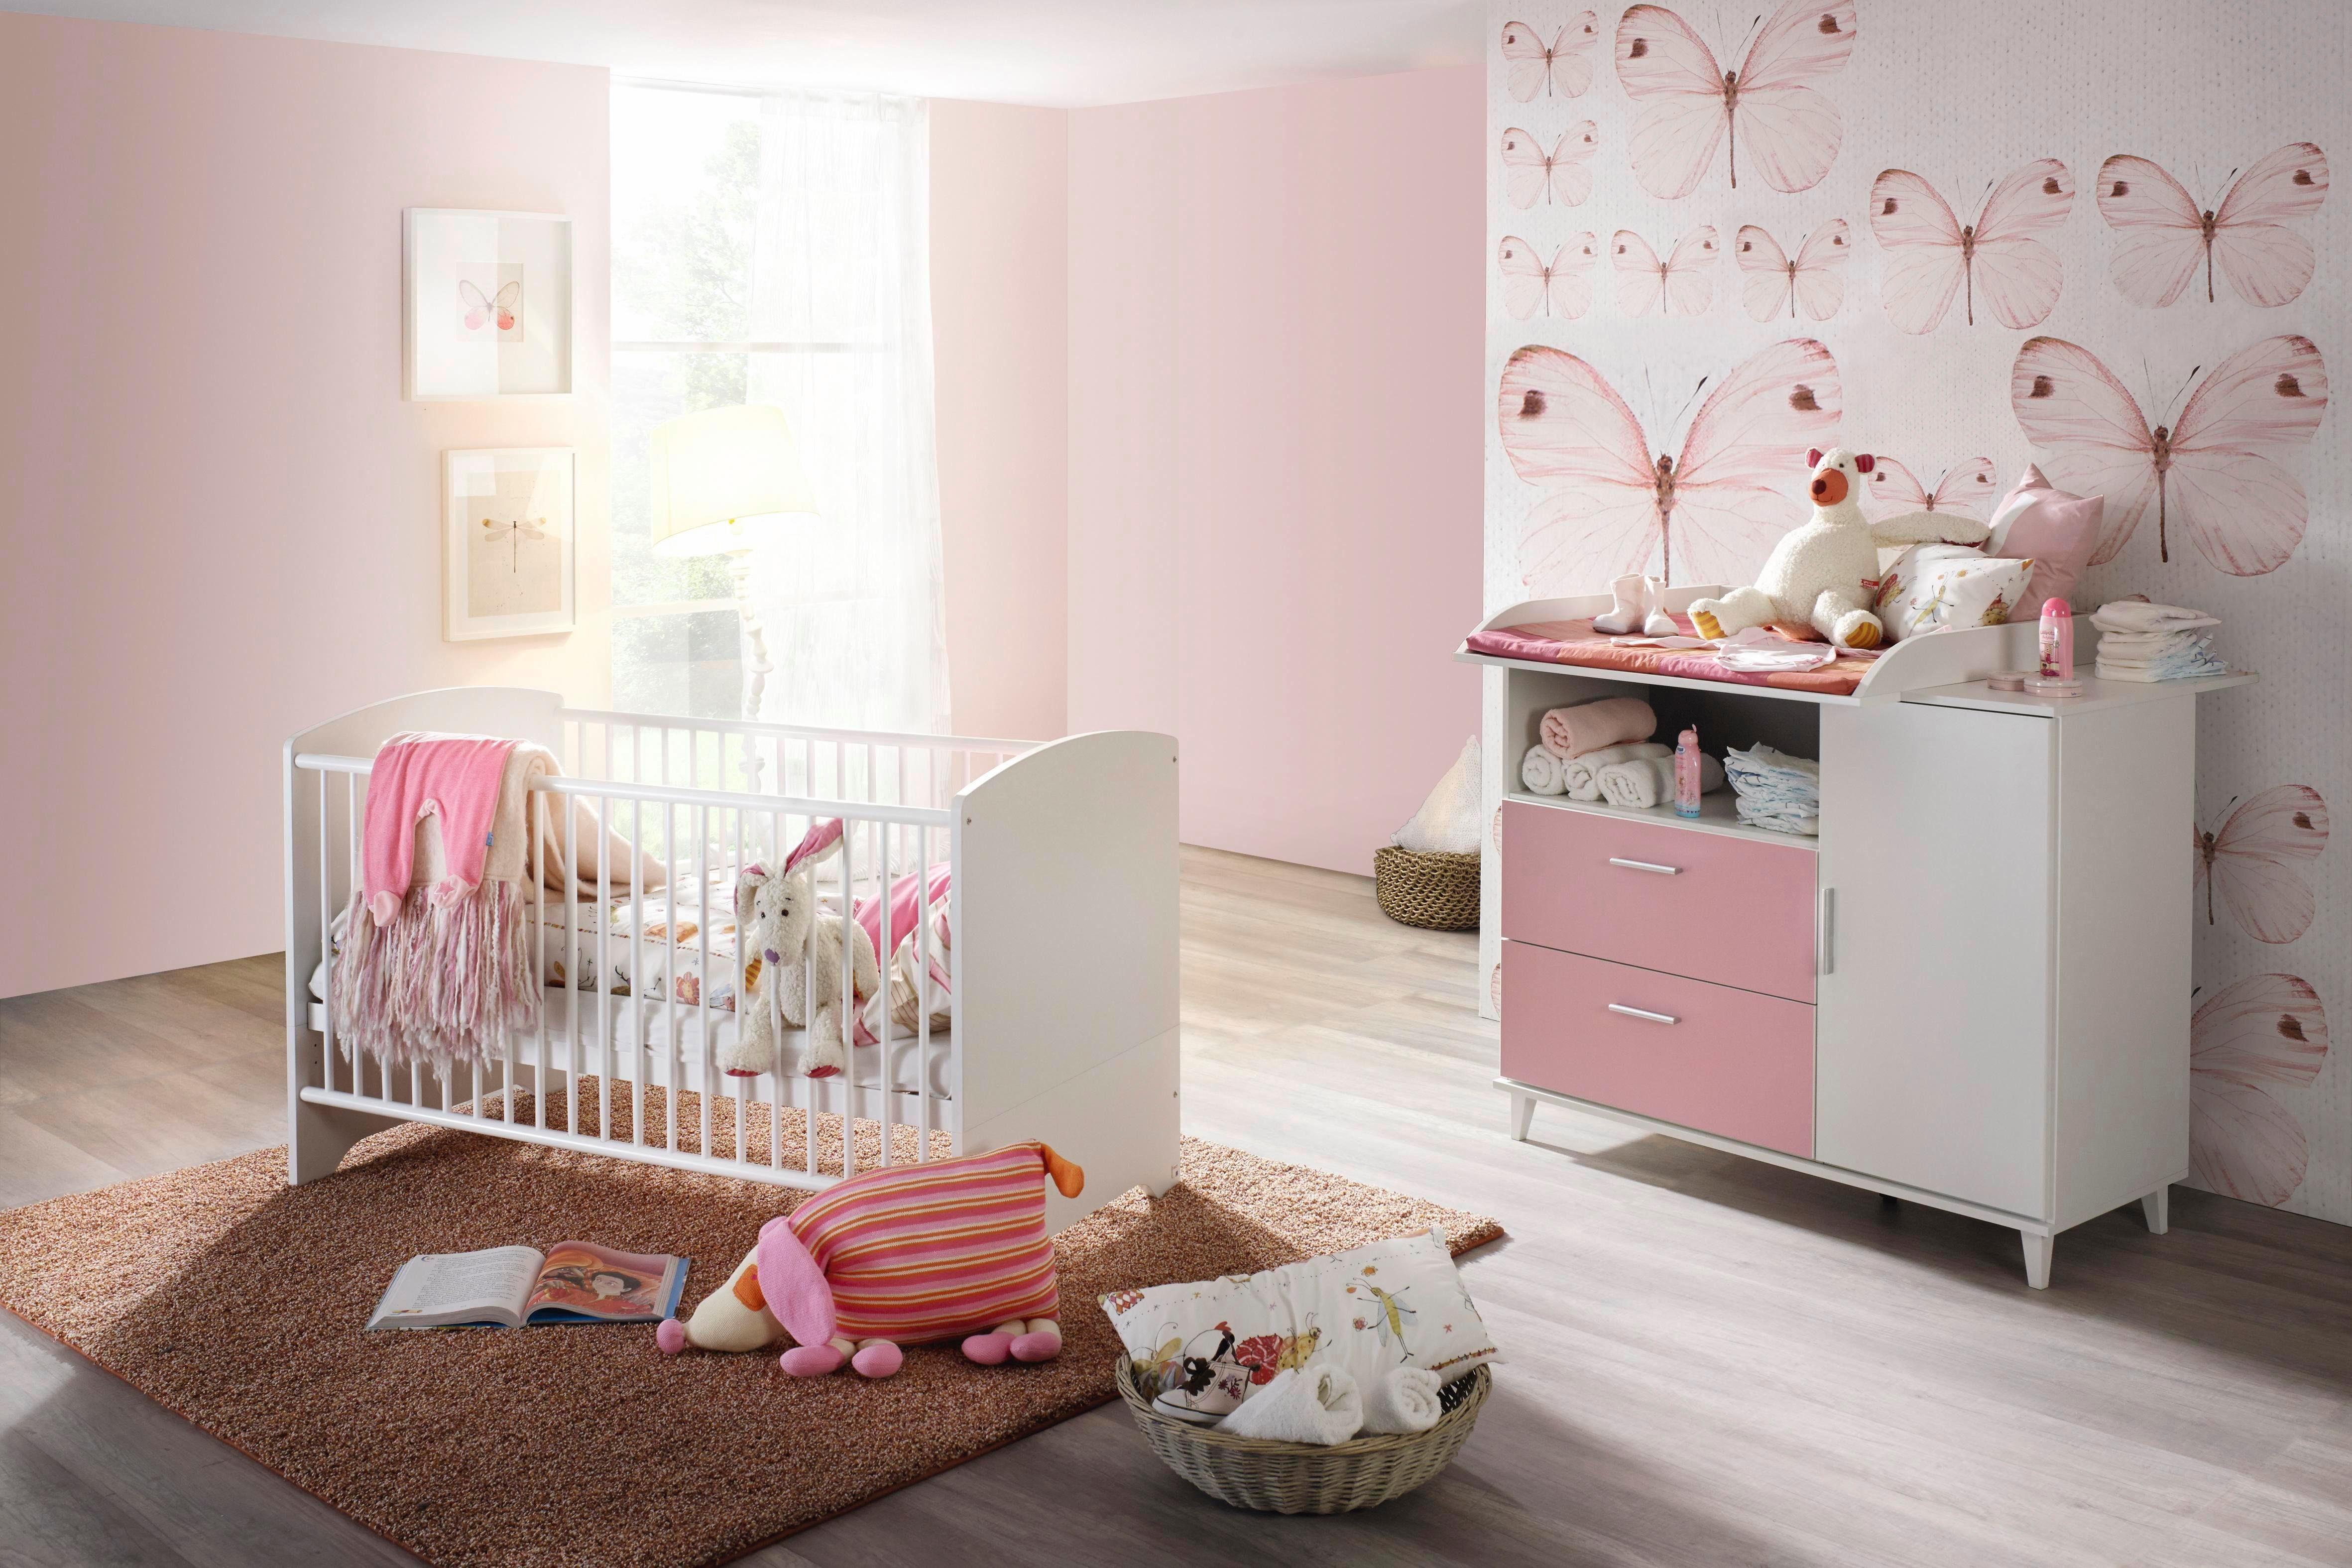 Babykamer Miami Kinderkamer : Babykamer nizza roze alpinewit online kopen bekijk nu onze